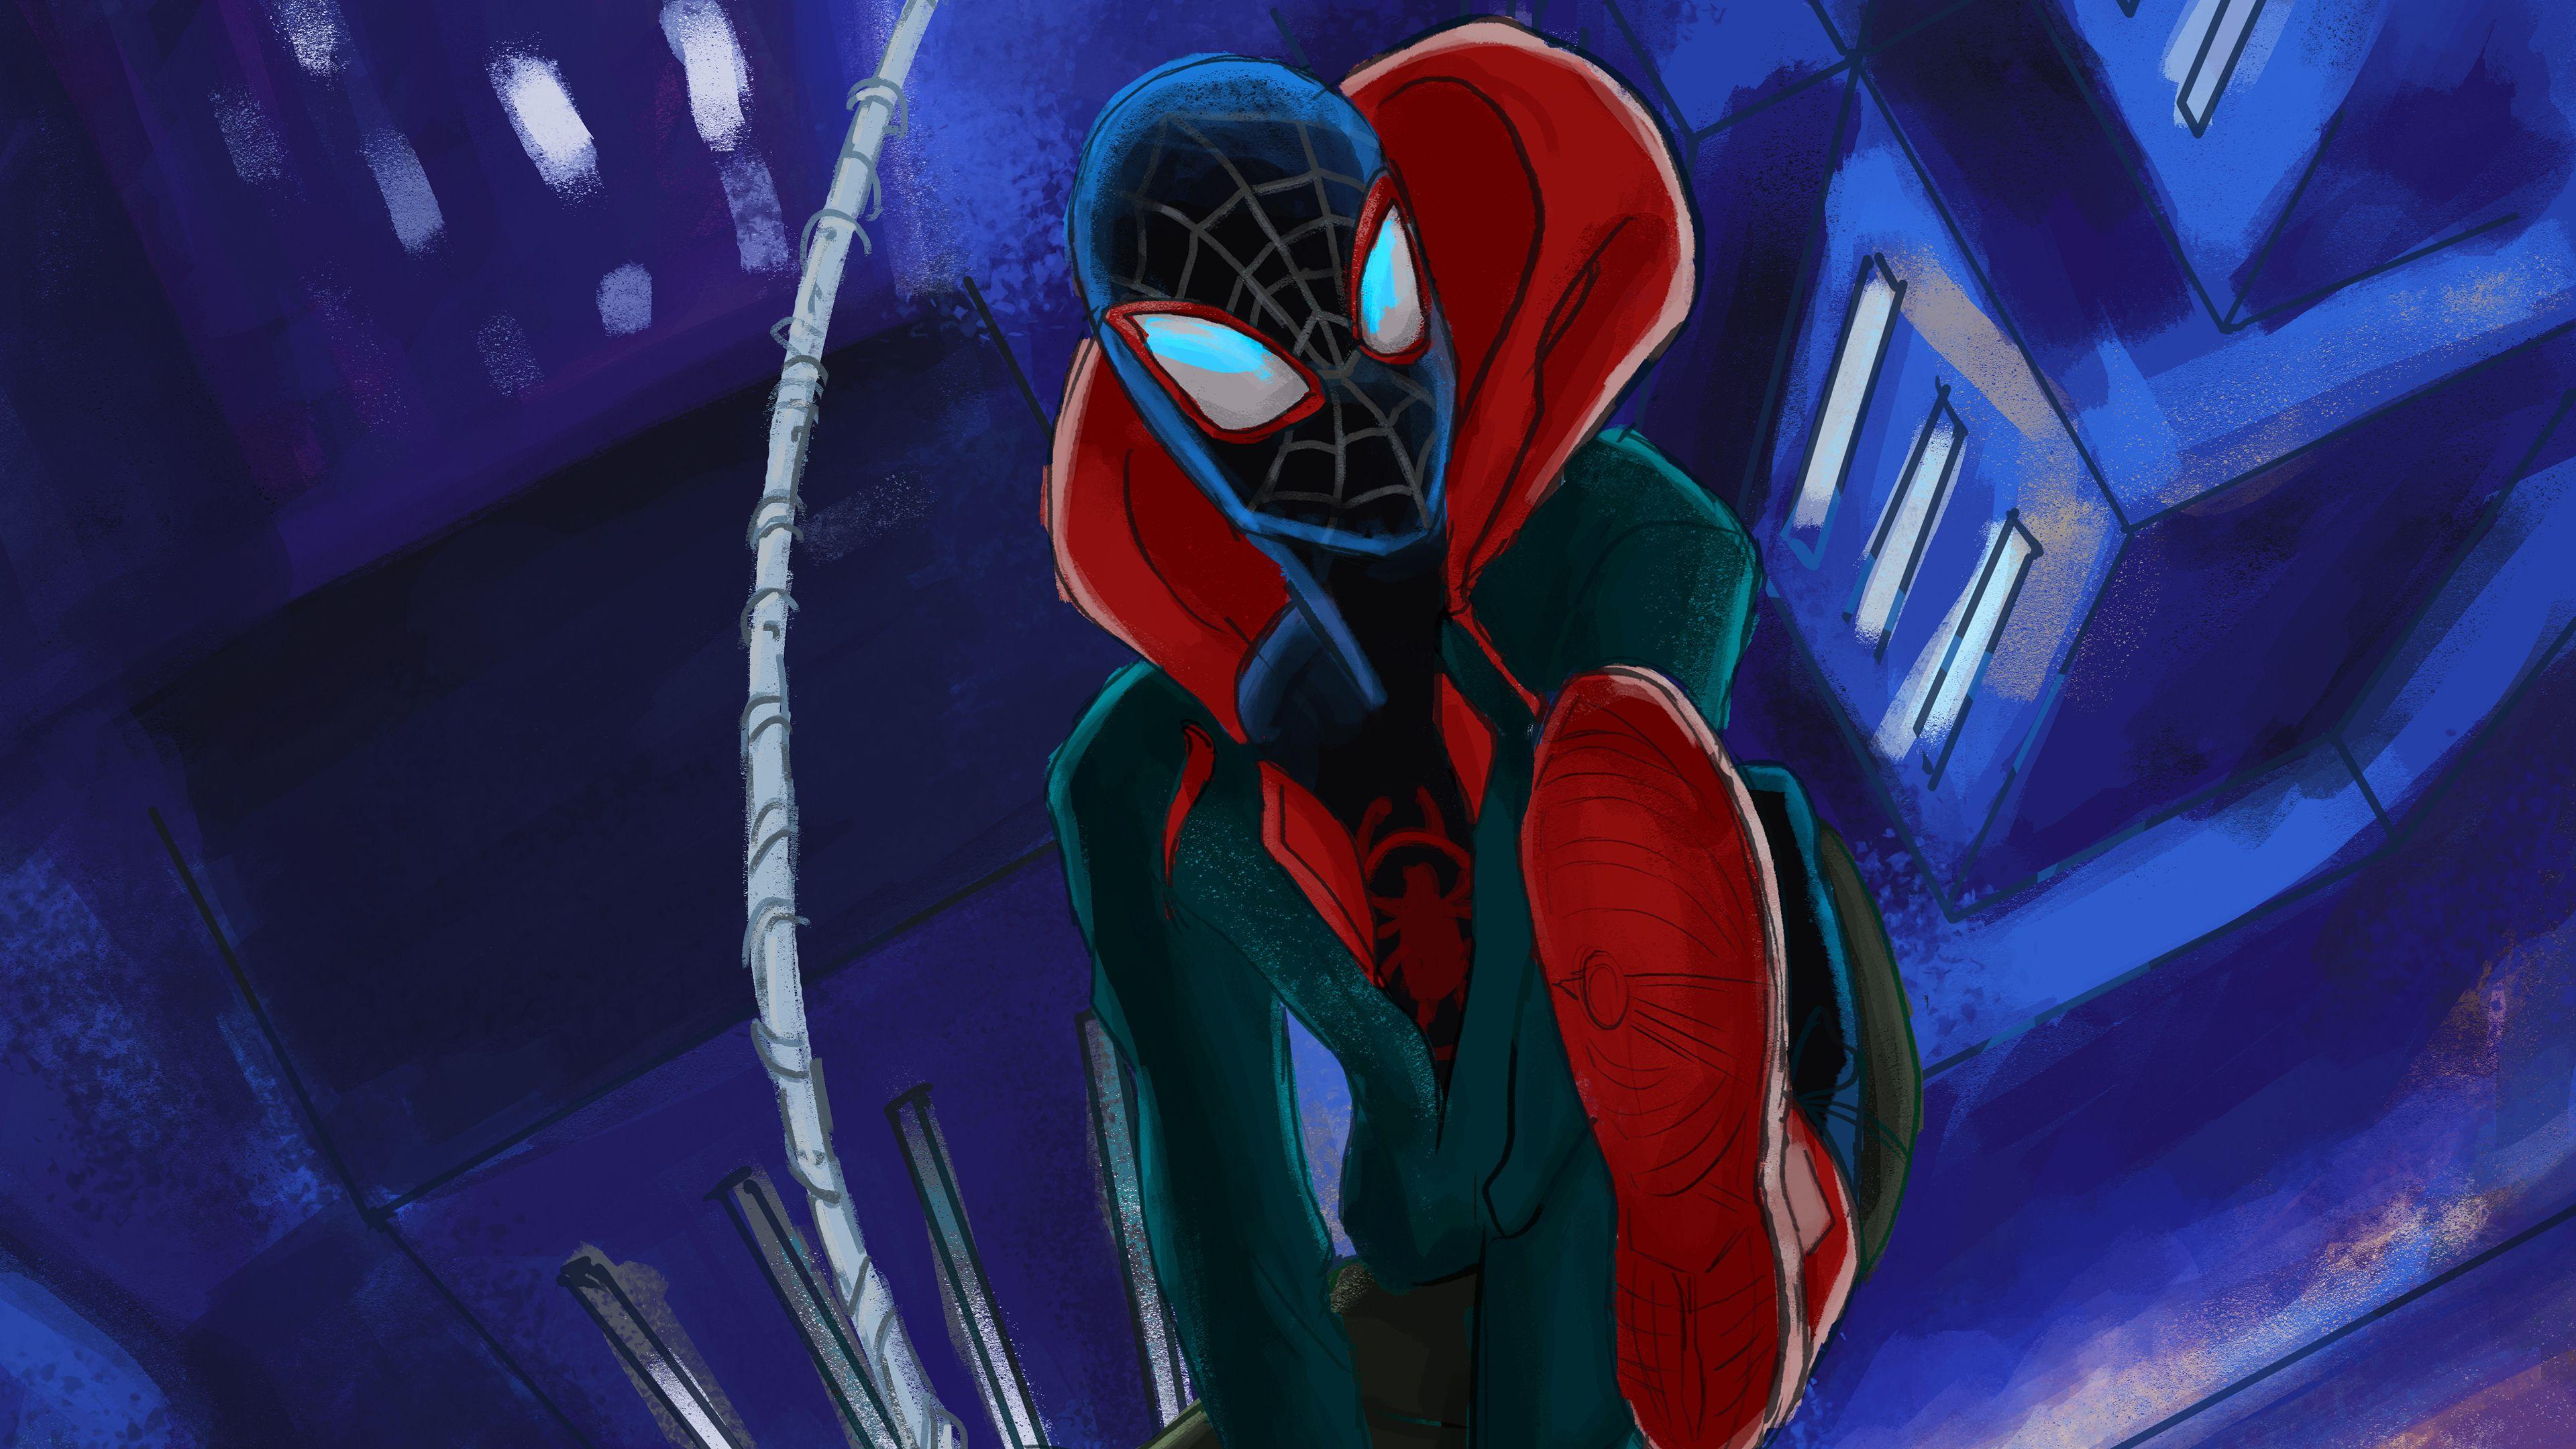 Spiderman Miles Morales Art 4k New Superheroes Wallpapers Spiderman Wallpapers Spiderman Into The Spider Verse Art Wallpaper New Superheroes New 4k Wallpaper